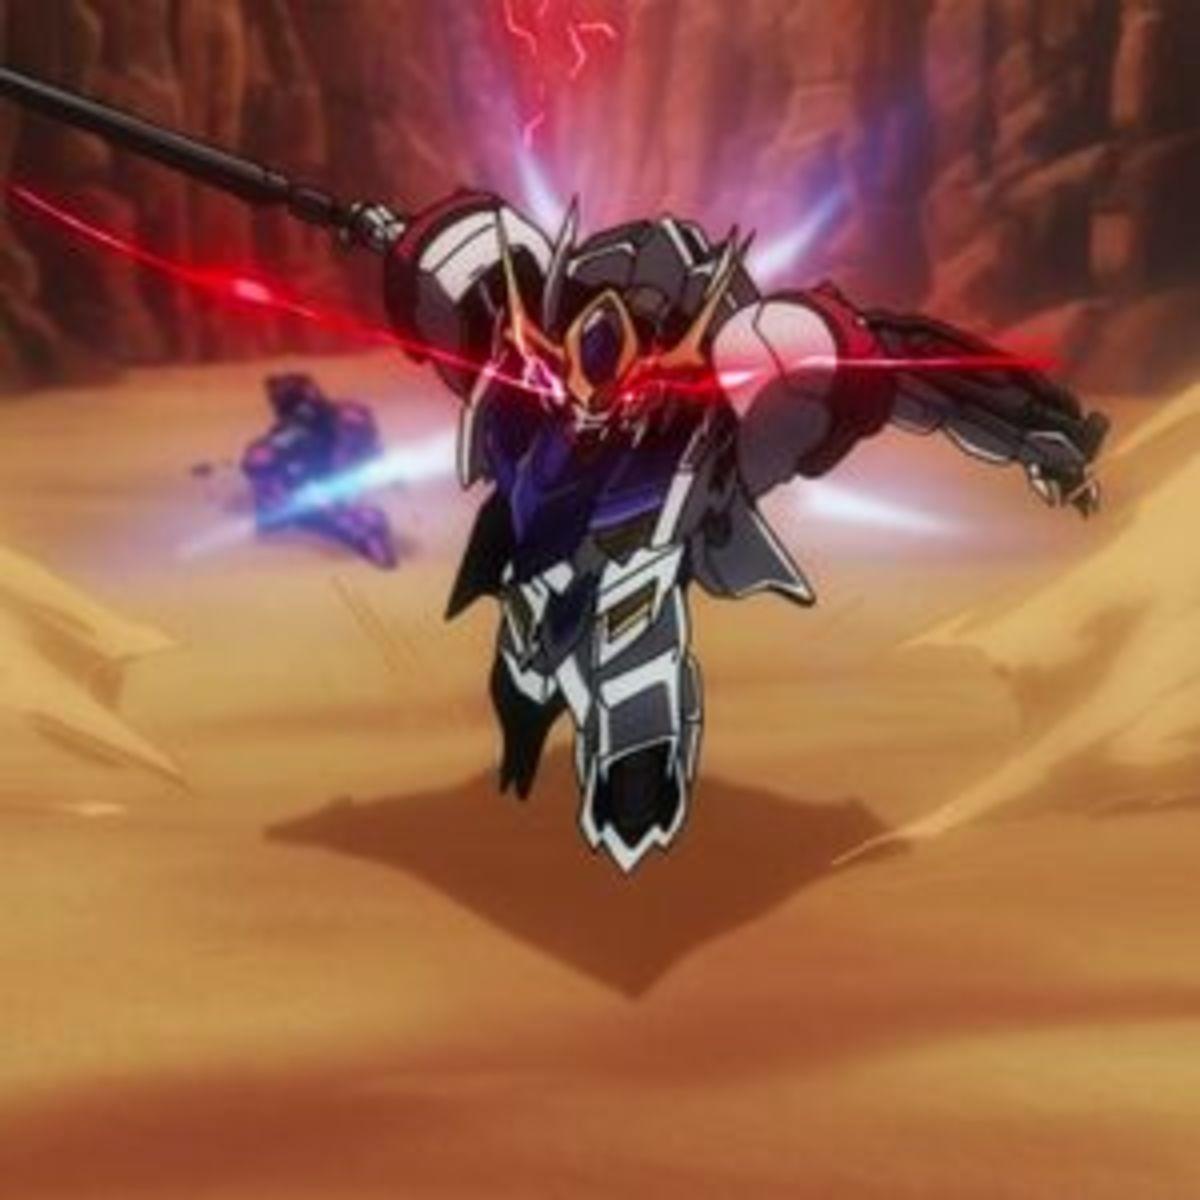 Gundam Barbatos Lupus Rex going berserk